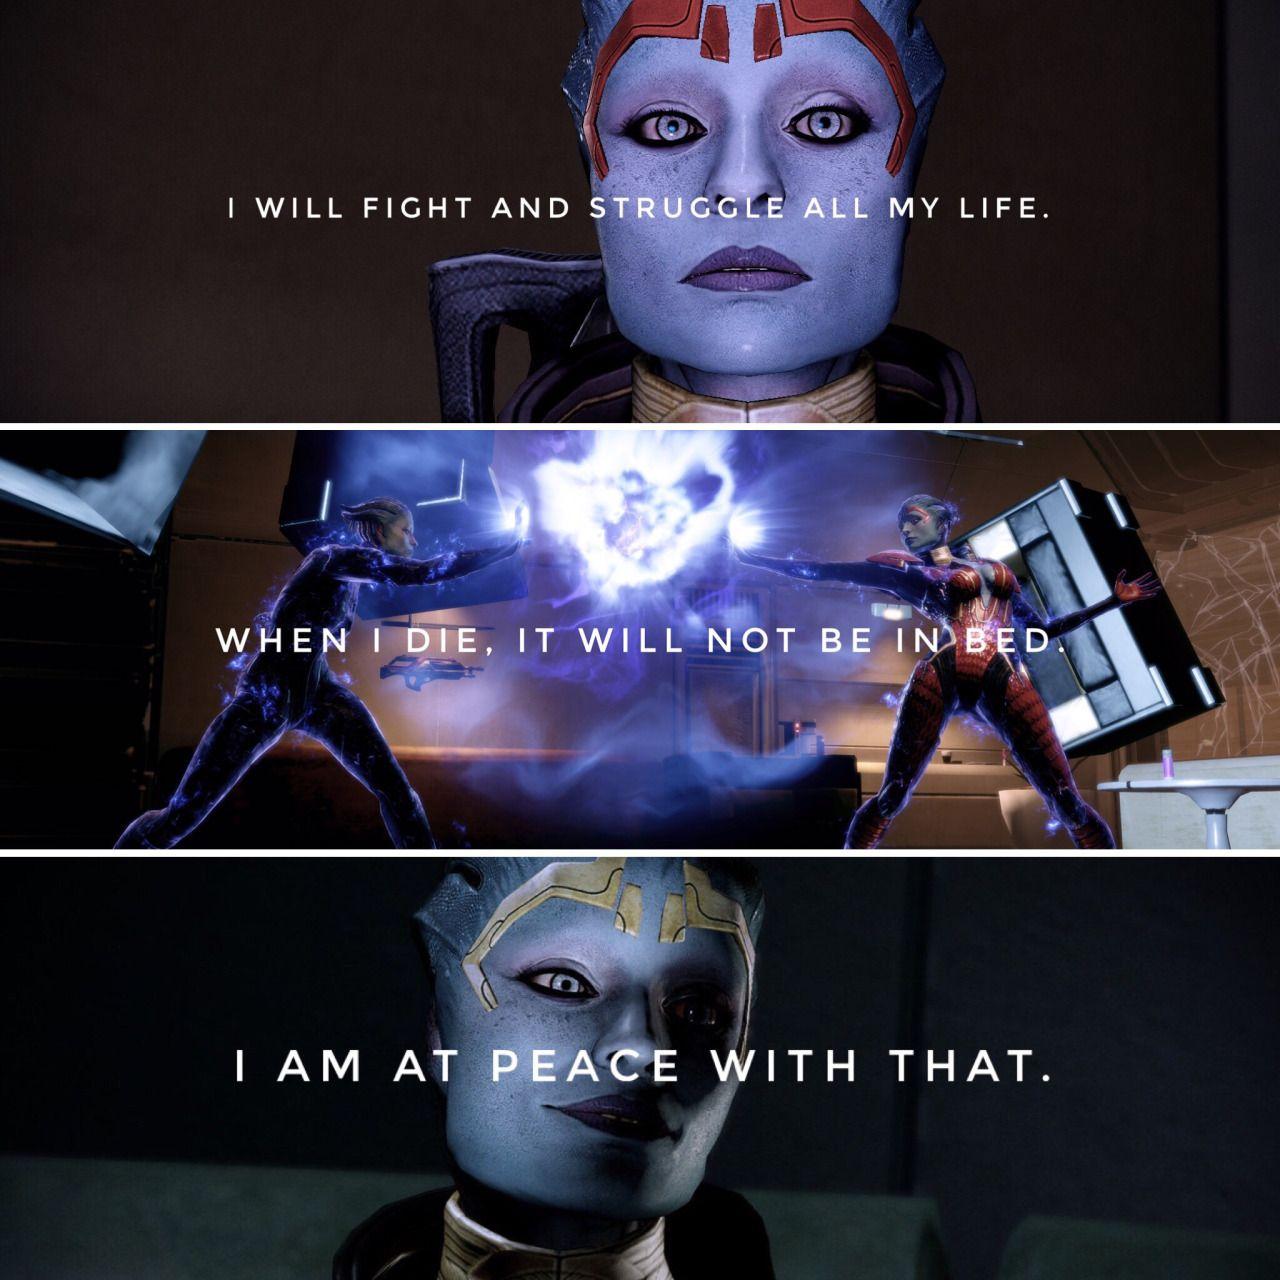 Samara I Will Fight And Struggle All My Life When I Die It Will Not Be In My Bed I Am At Peace With That Ma Mass Effect Art Mass Effect